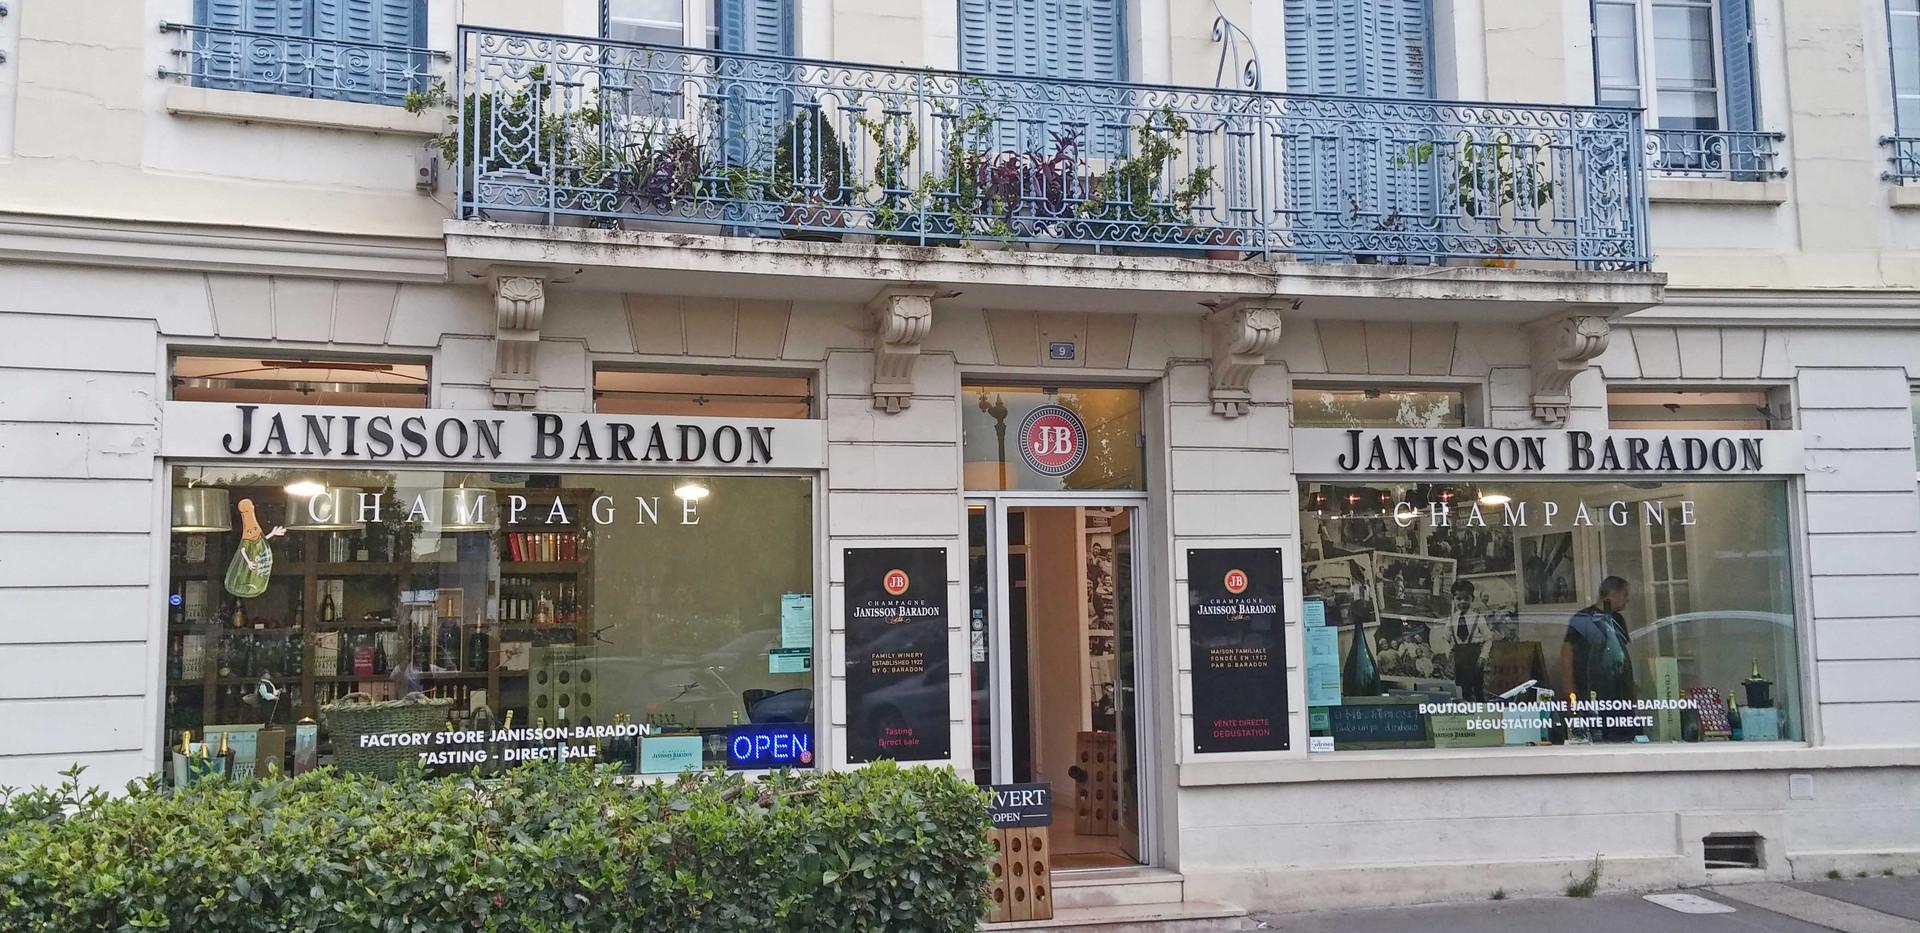 Boutique Champagne Janisson-Baradon - Epernay